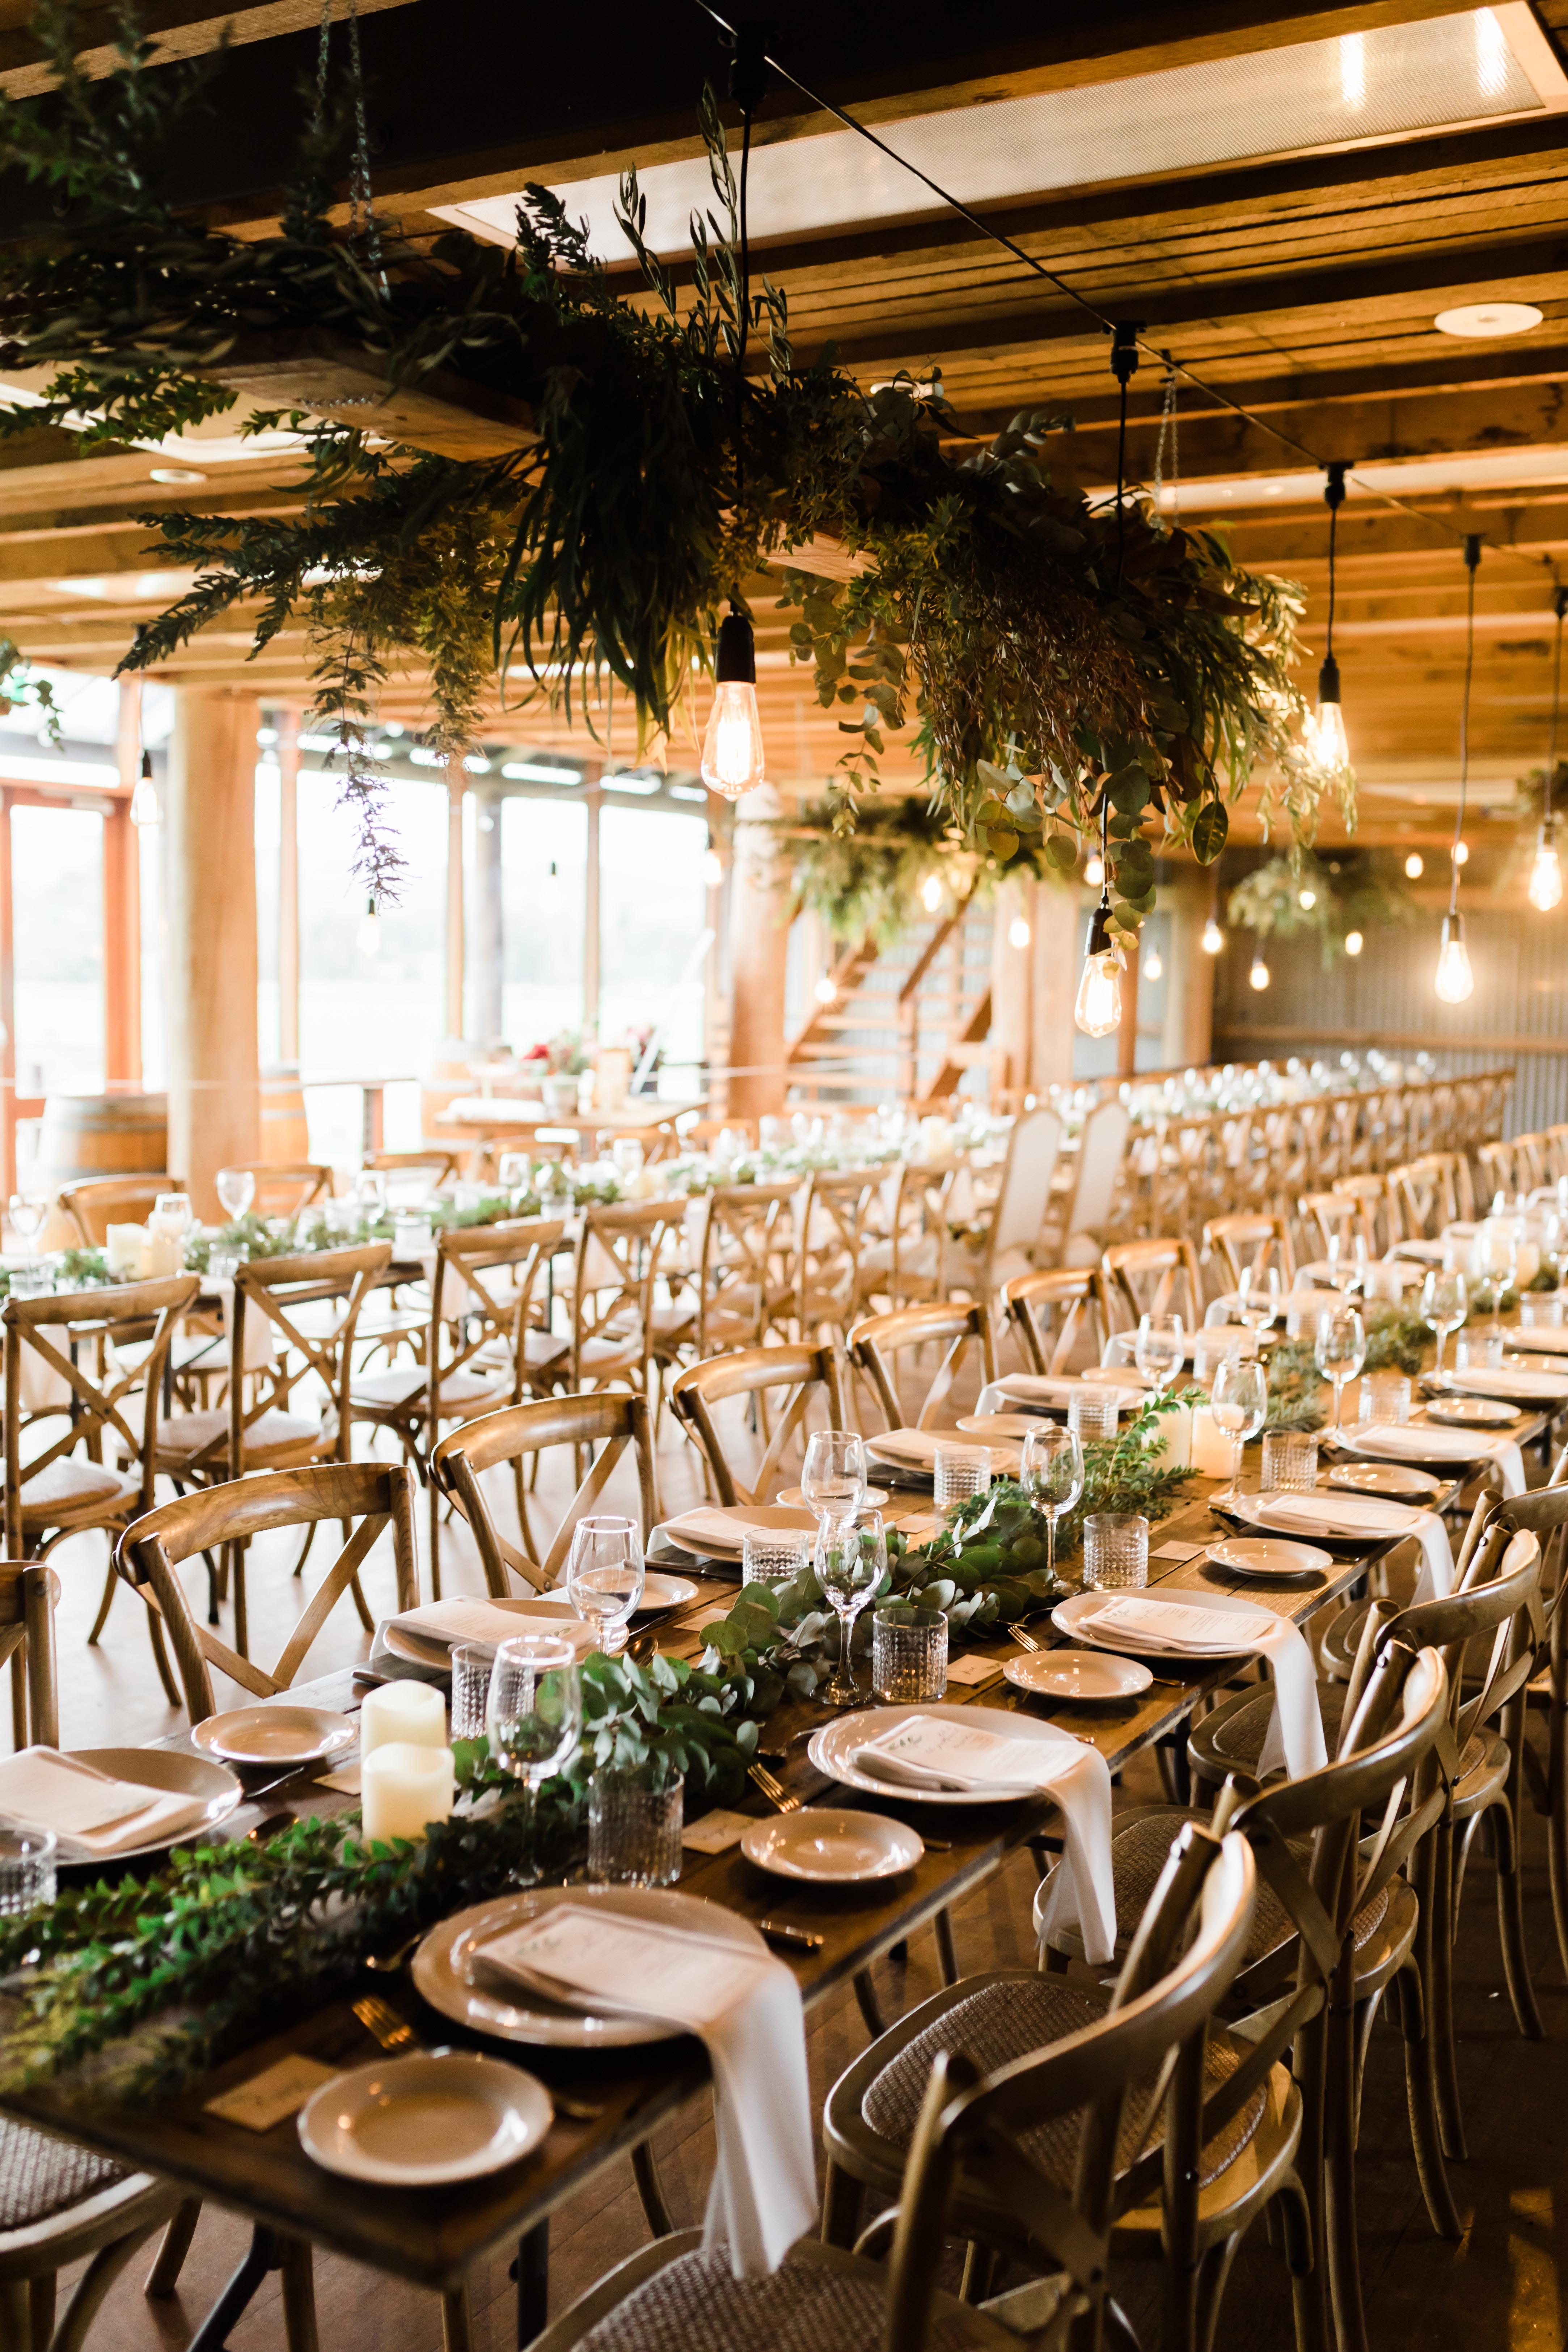 white dinnerware set on brown wooden dining sets inside room